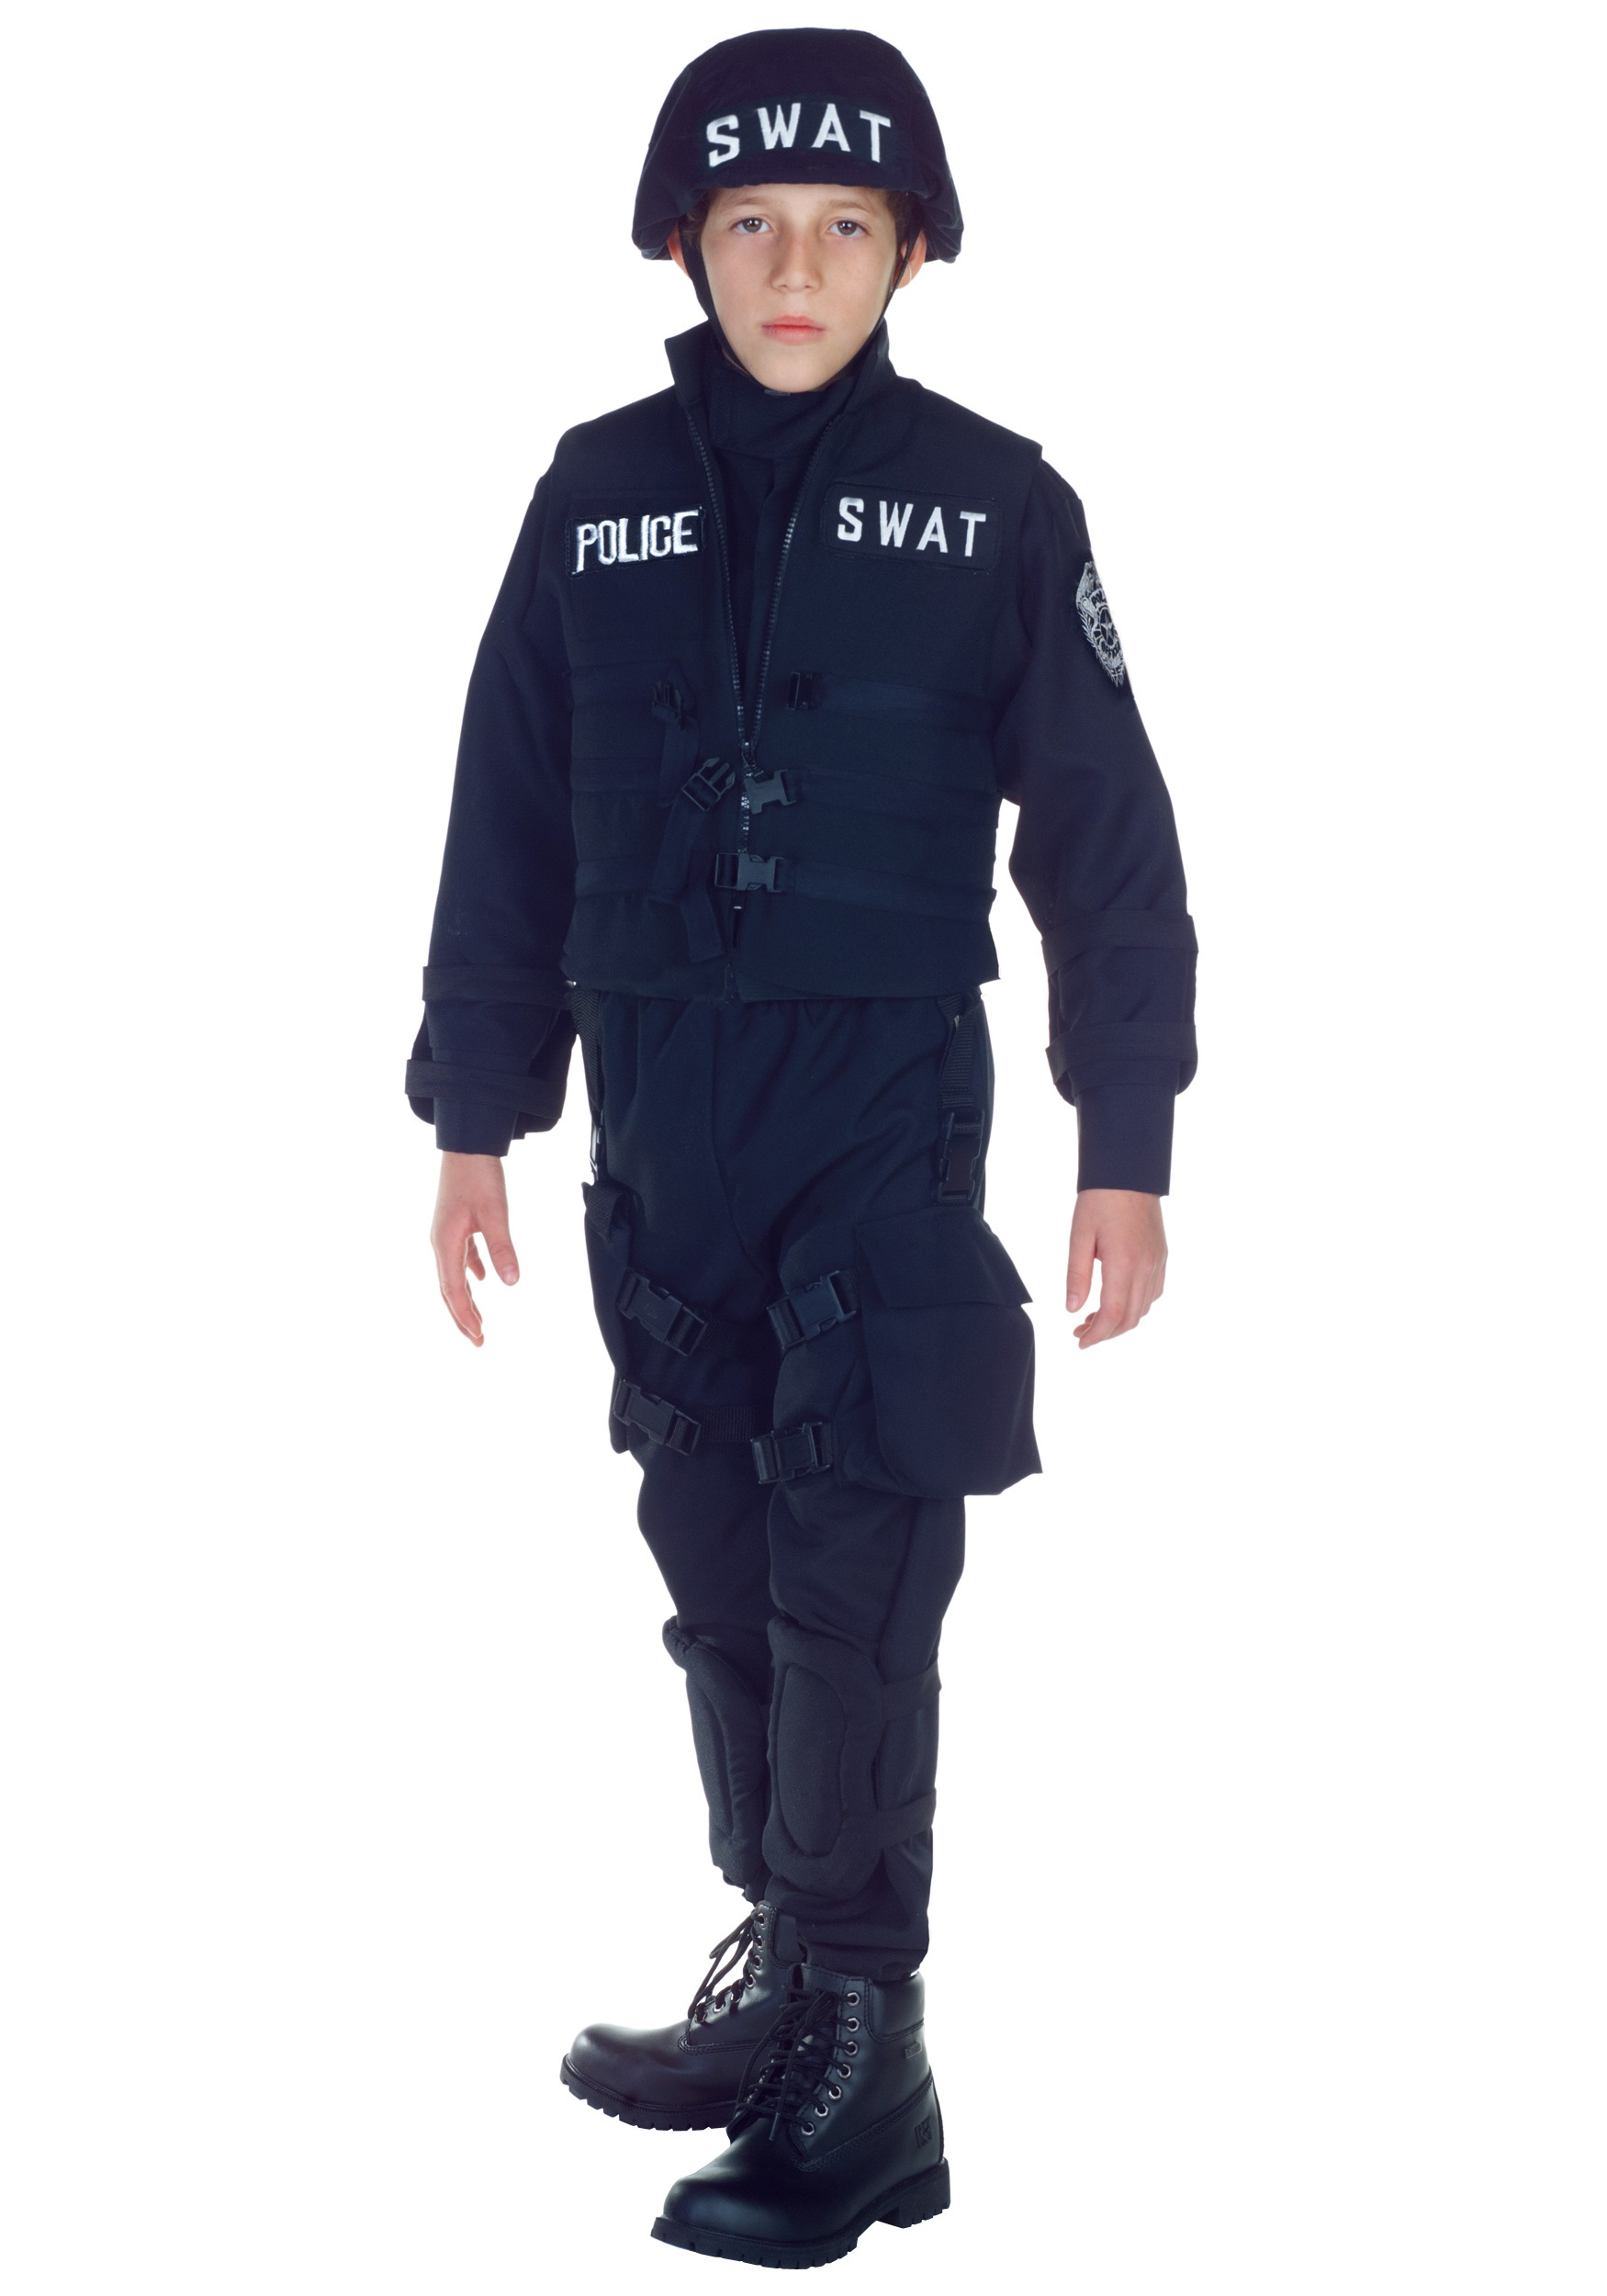 SWAT Costumes